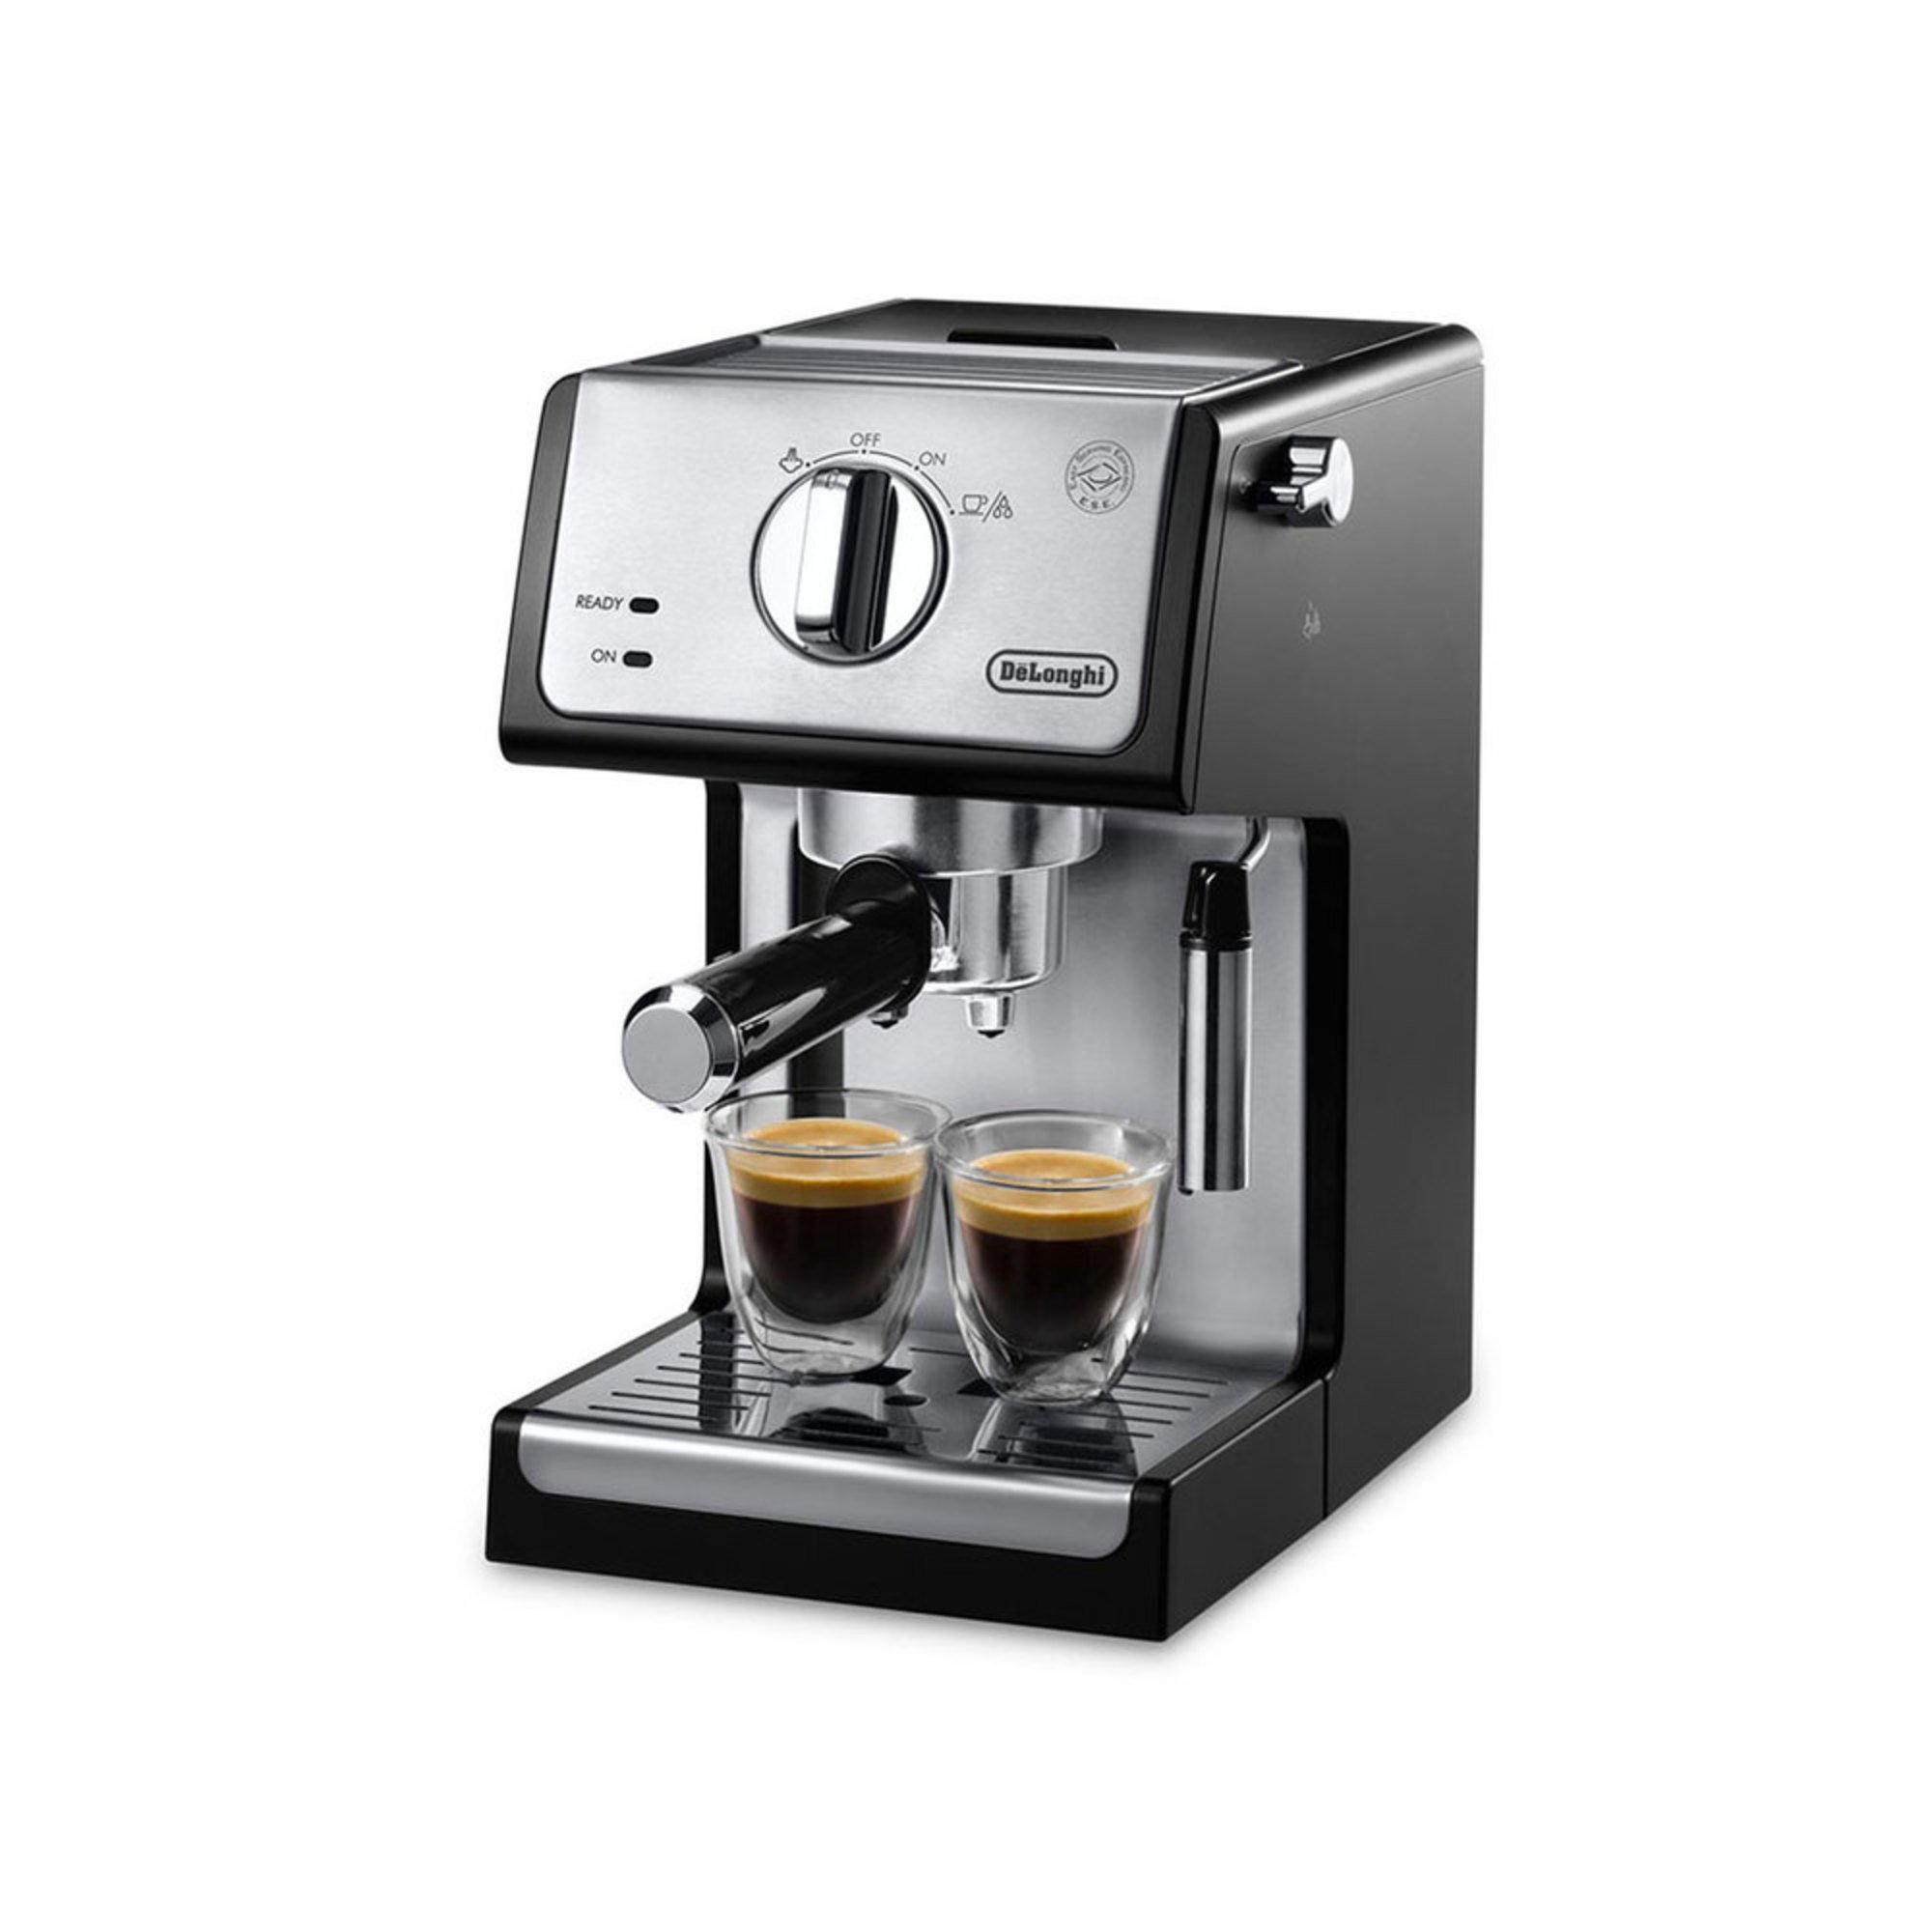 Delonghi Coffee Maker Official Site : De longhi 15 Bar Pump Coffee & Espresso Maker (ecp3420) Coffee Makers For The Home - Shop ...